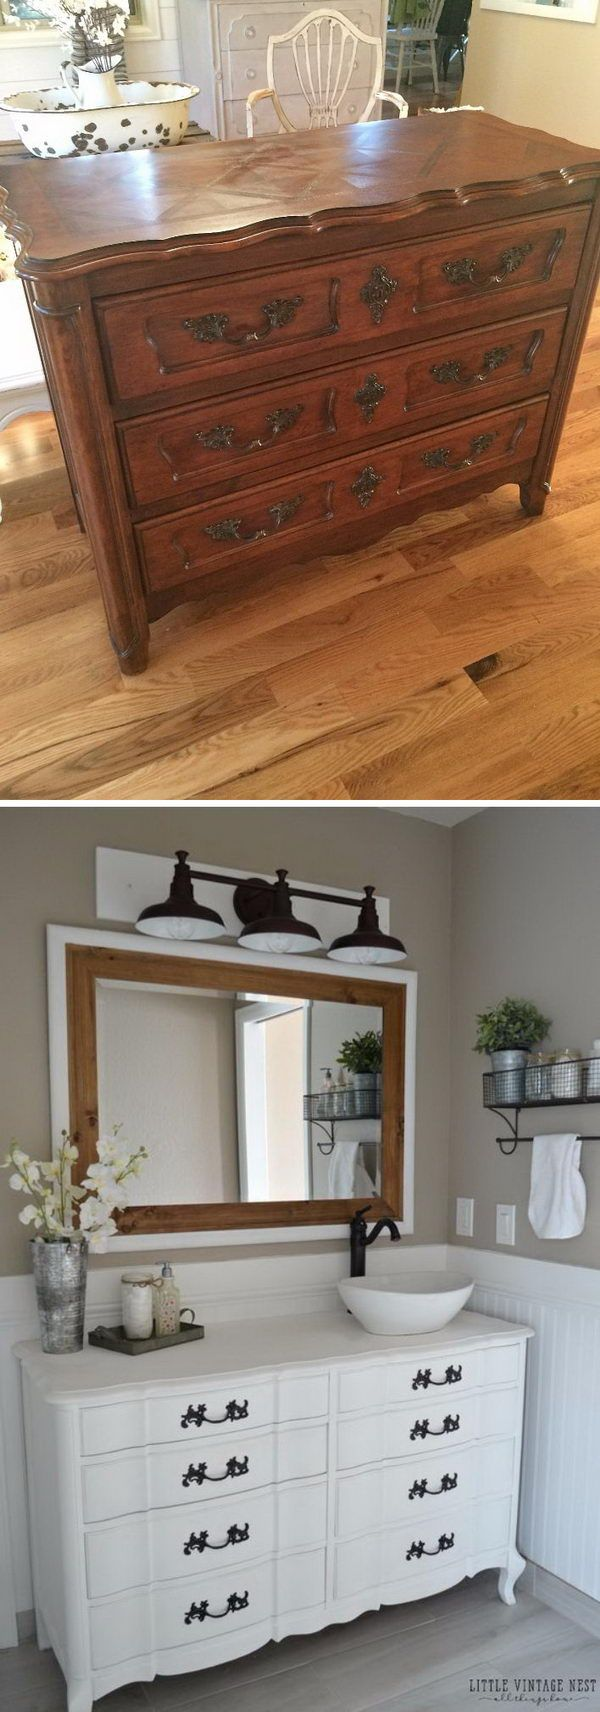 Antique dresser bathroom vanity - Amazing Diy Ideas To Transform Your Old Furniture